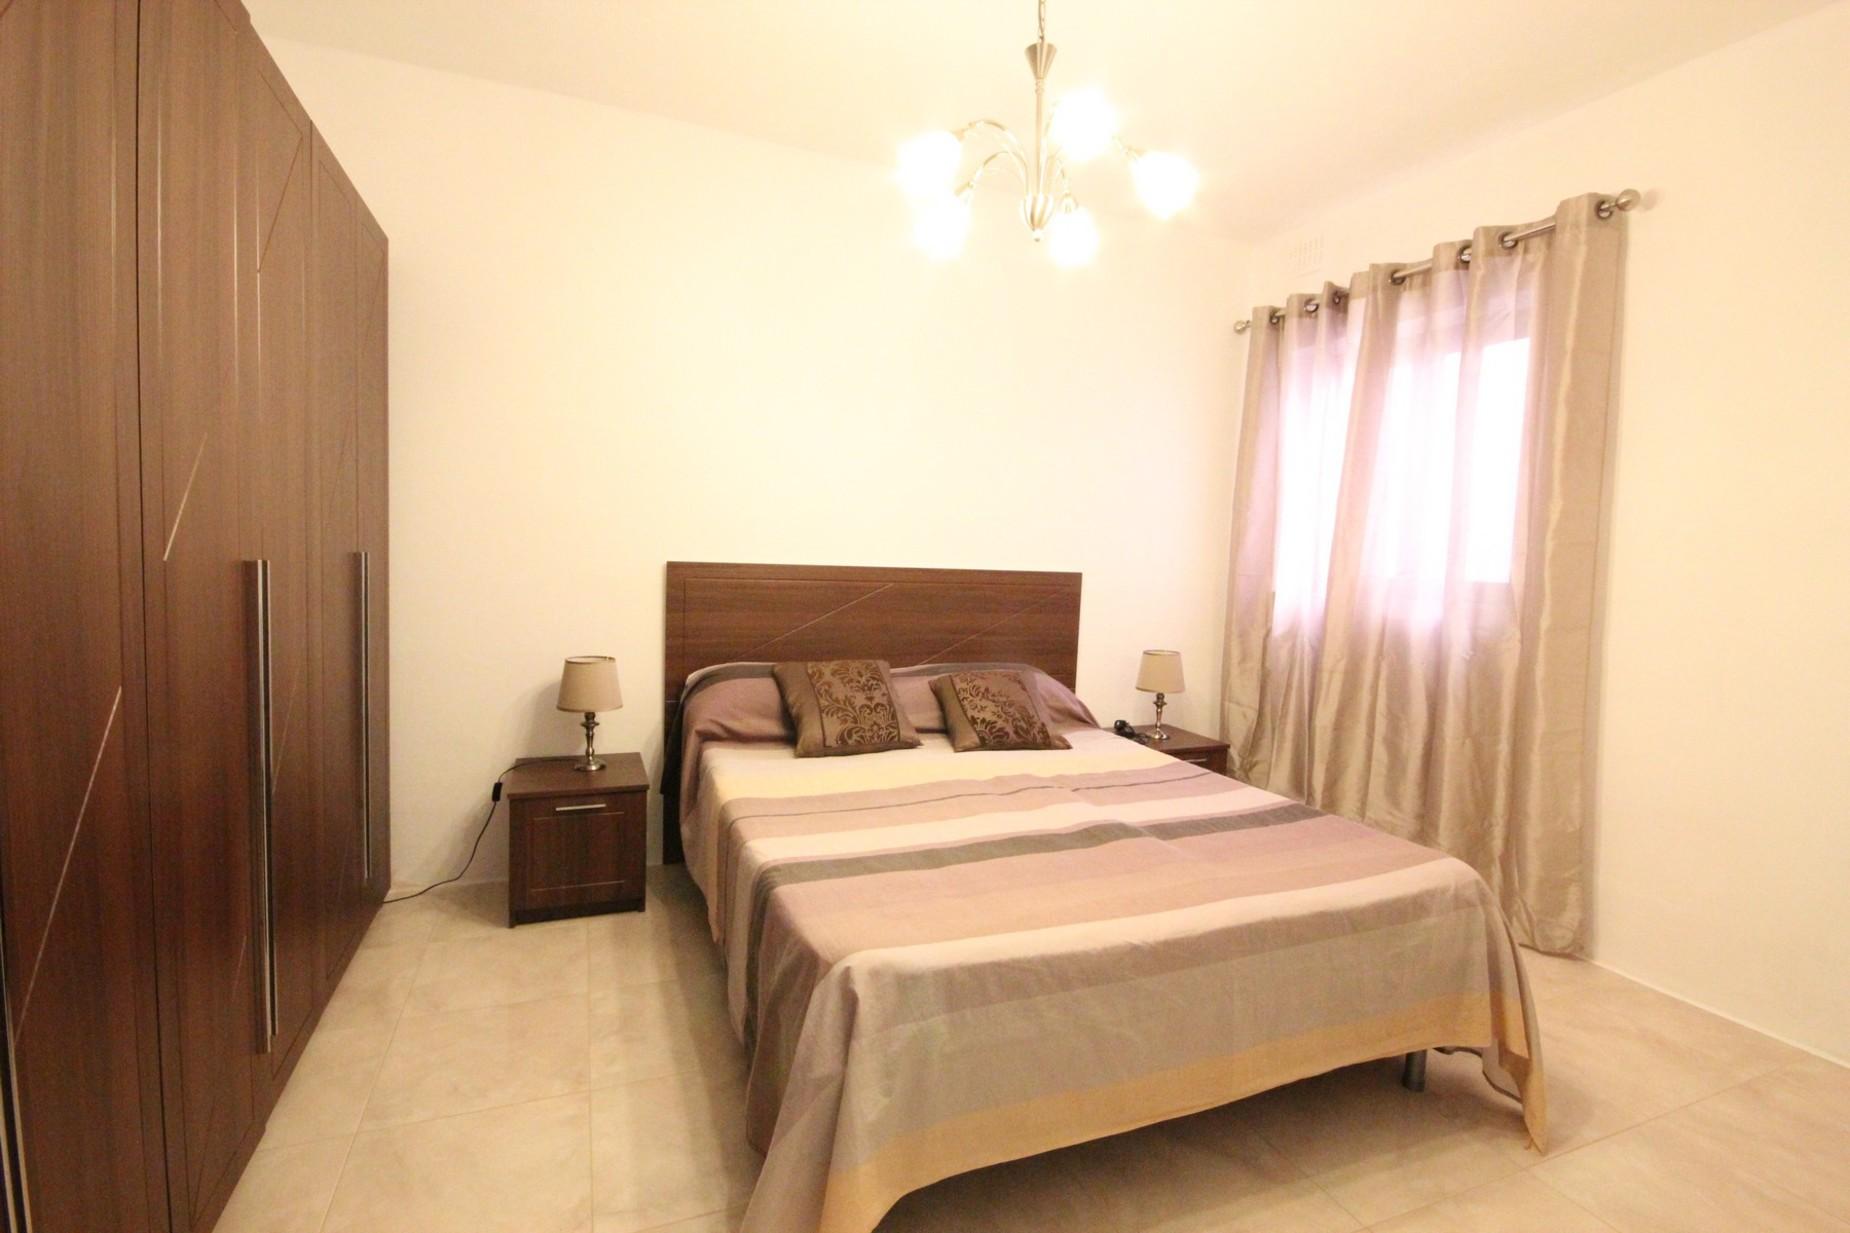 3 bed Apartment For Rent in Naxxar, Naxxar - thumb 7